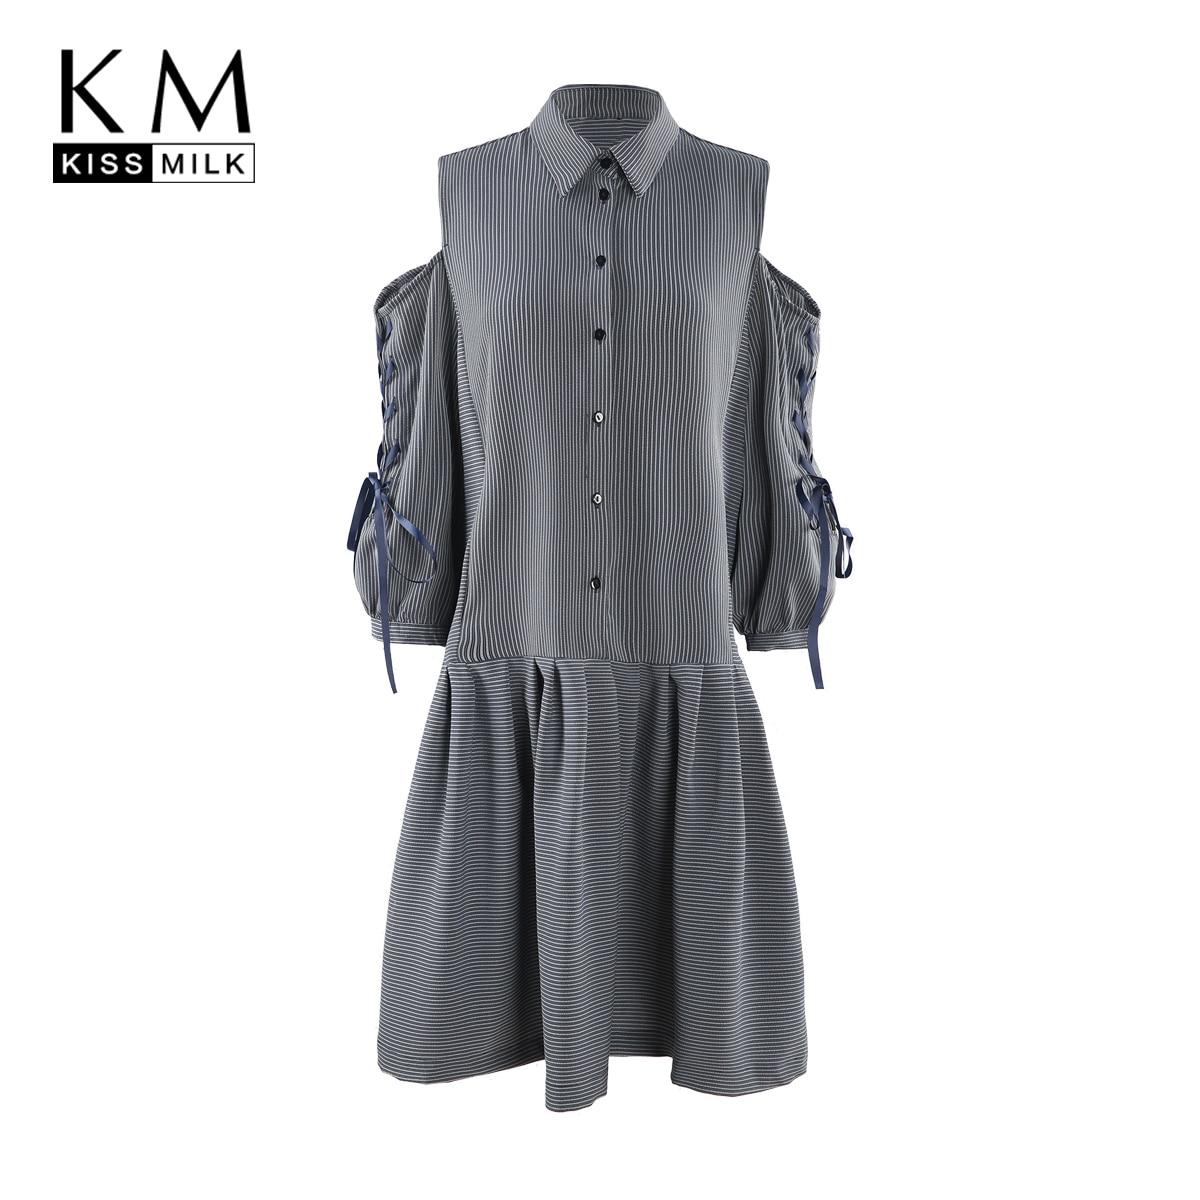 kissmilk 2018 Plus Size Knee Length Women Dress Turn Down Collar Off Shoulder Three Quarter Sleeve Button Plaid Big Size Dress plus size inclined button hankerchief dress